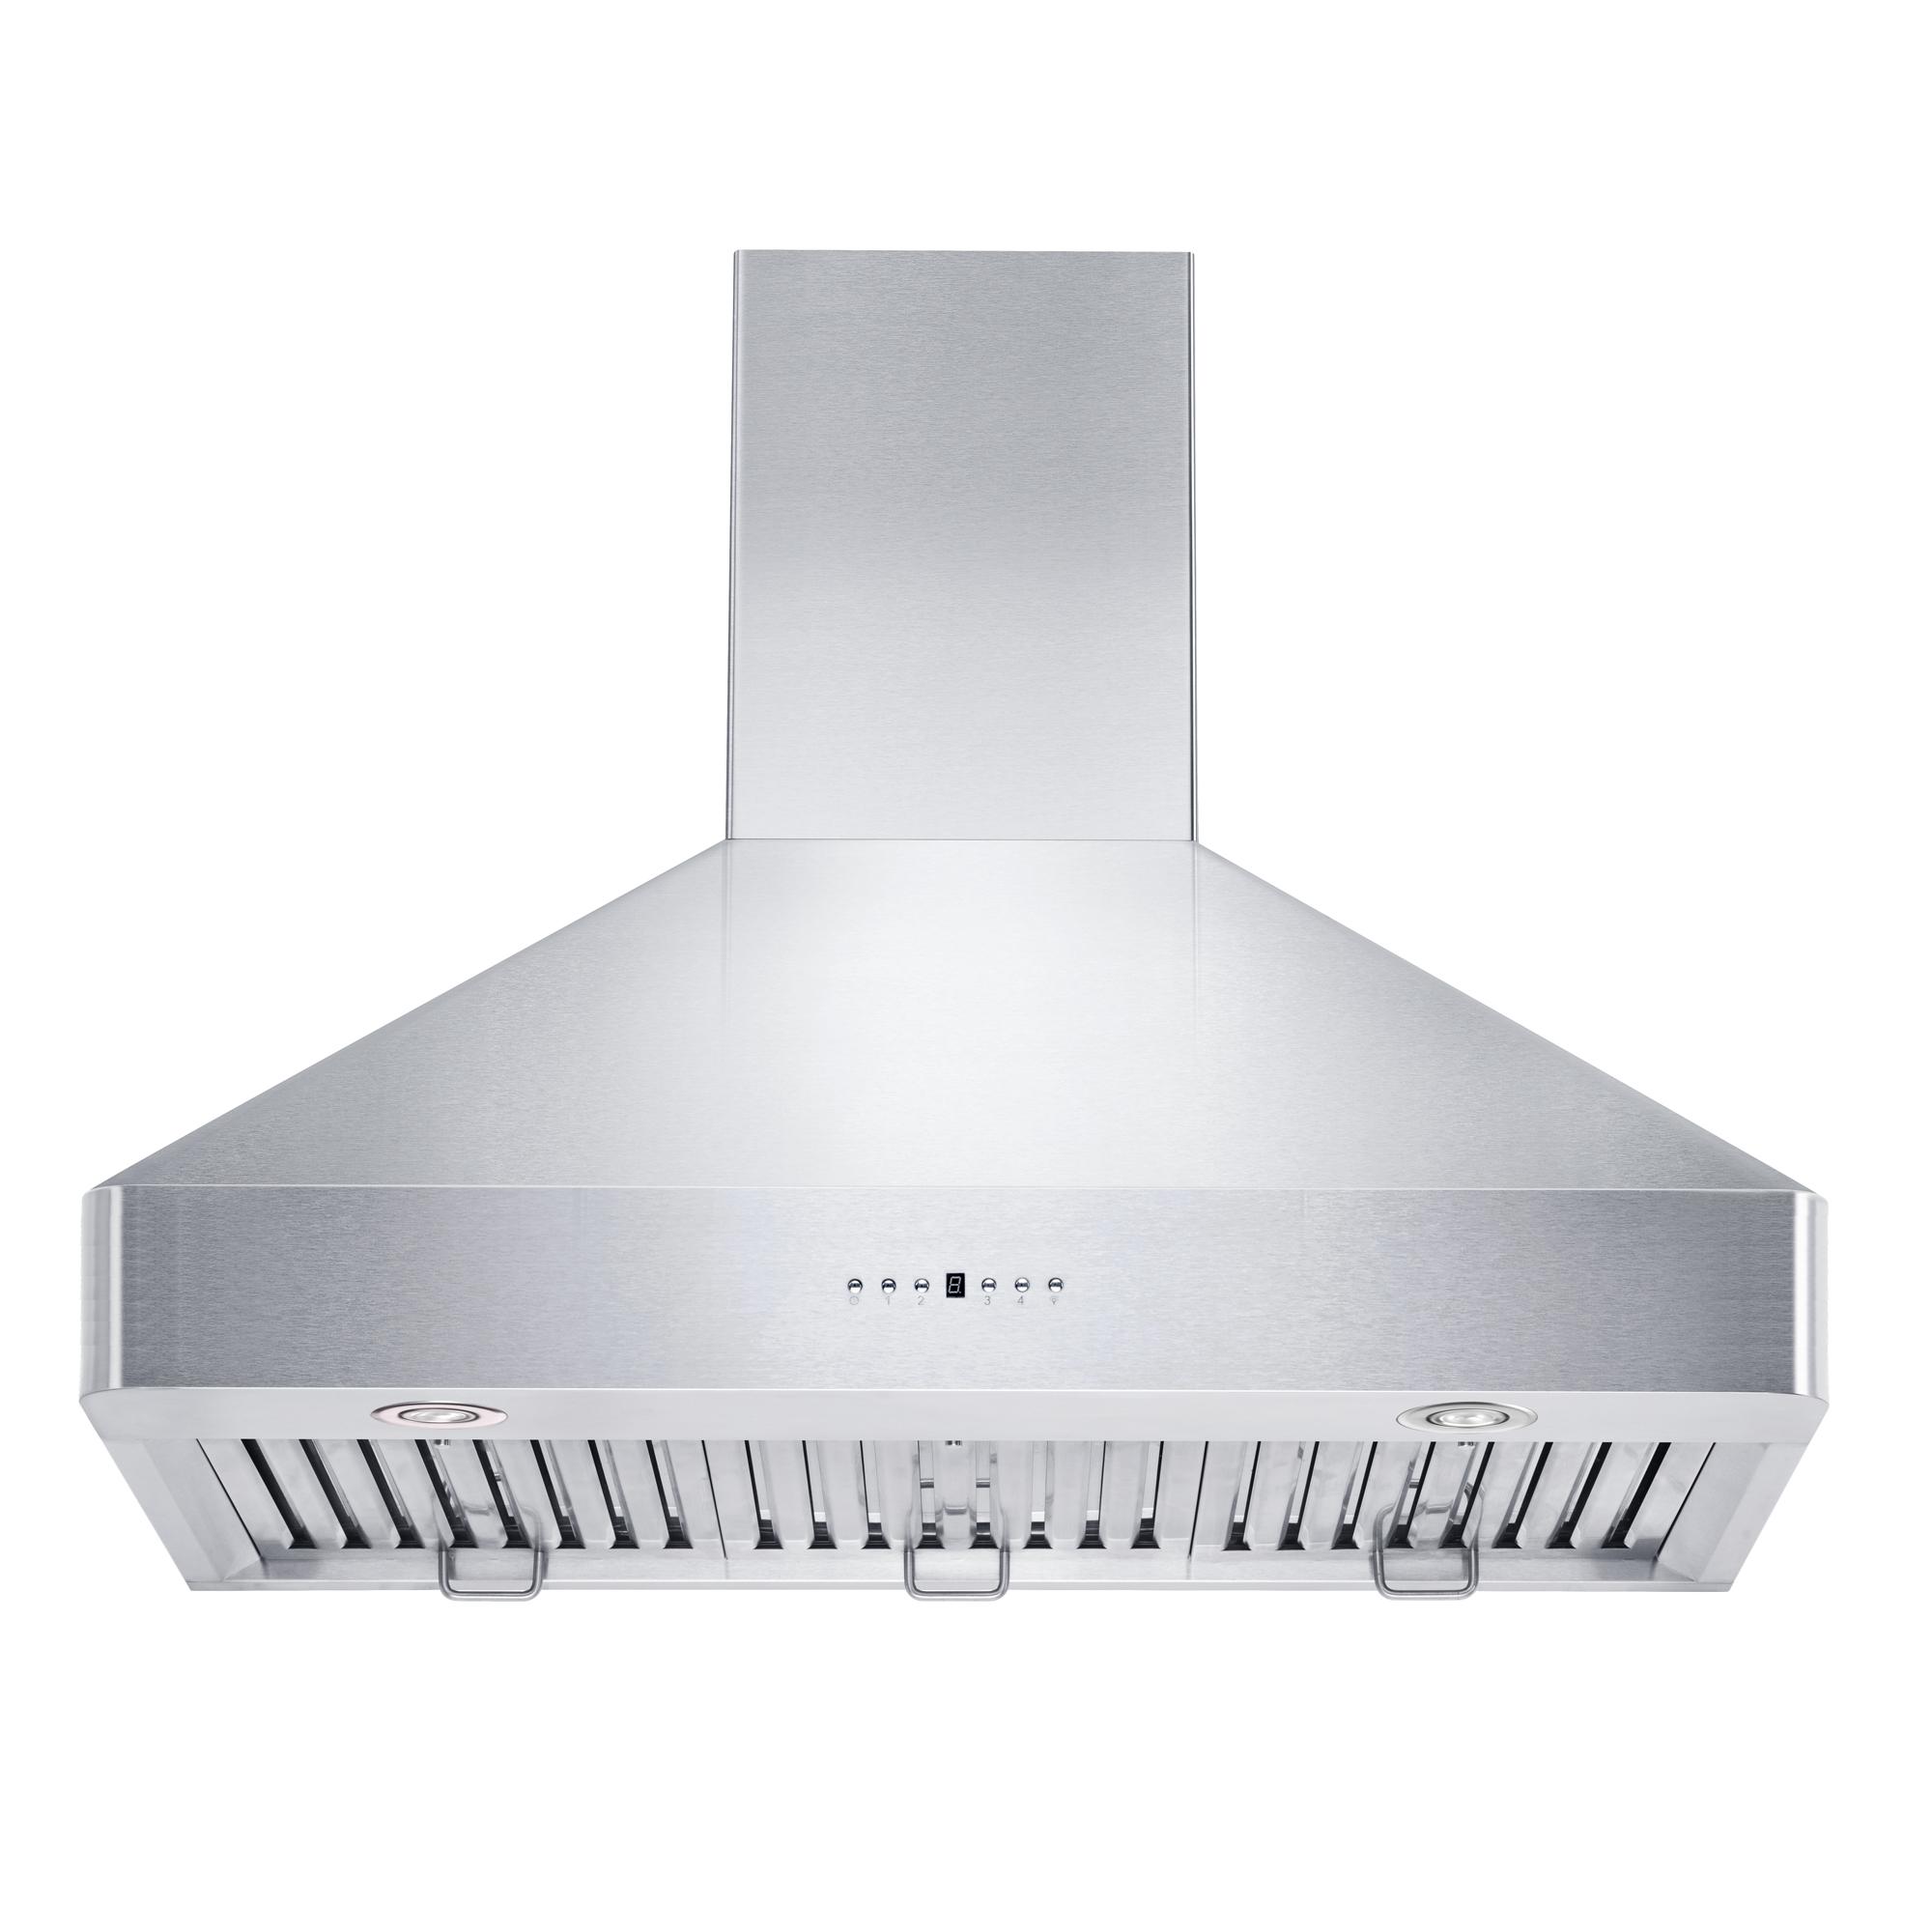 zline-stainless-steel-wall-mounted-range-hood-kf2-new-under.jpg